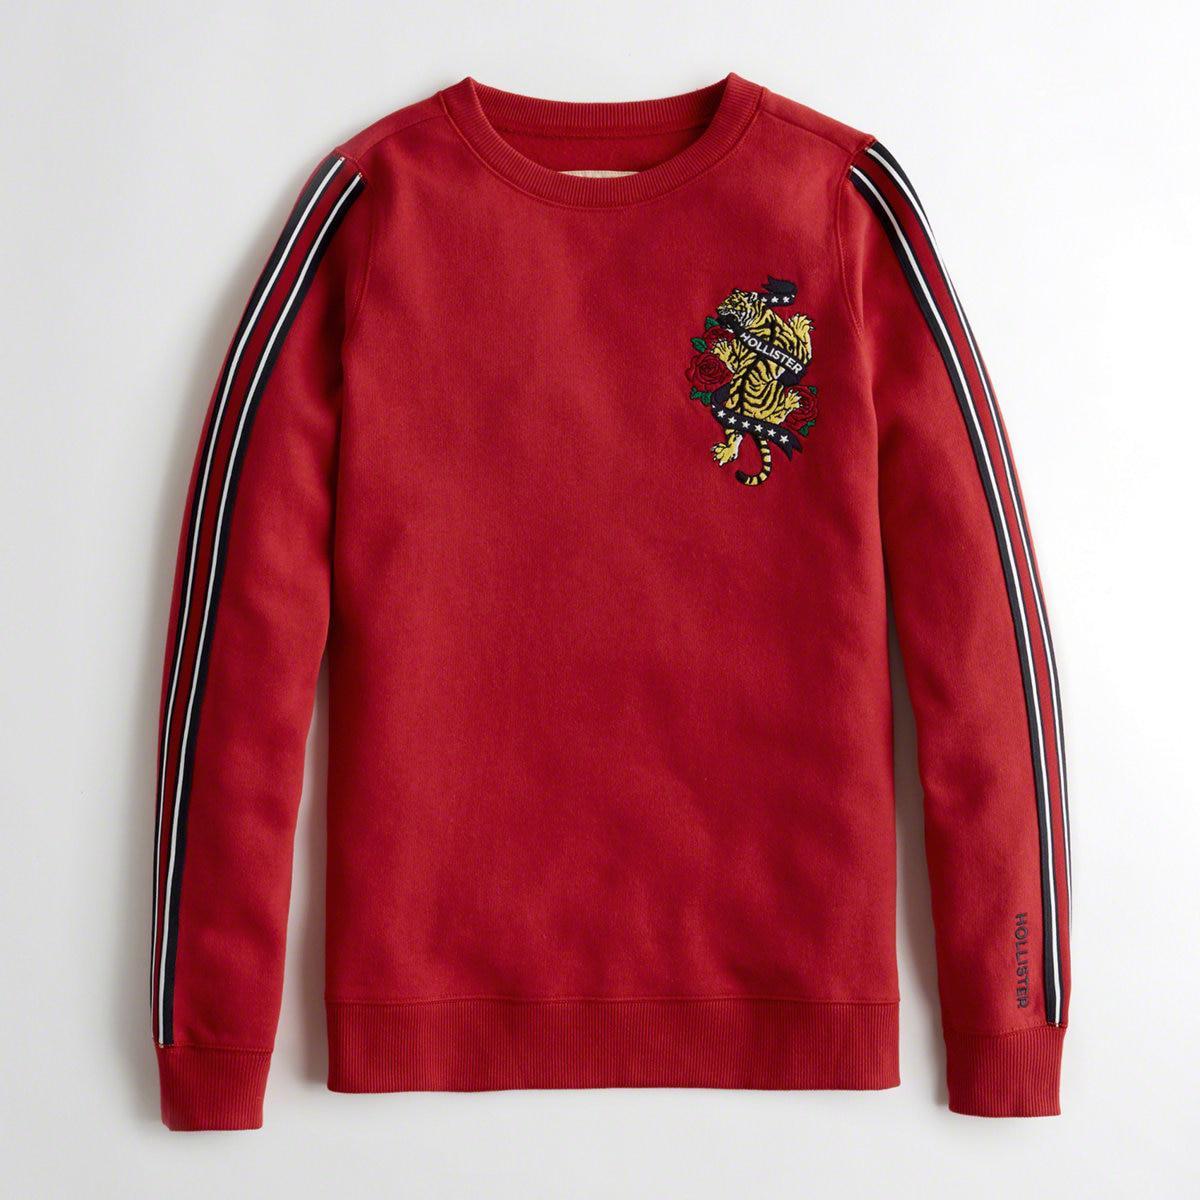 b66d18127 Hollister - Red Girls Americana Oversized Crewneck Sweatshirt From  Hollister - Lyst